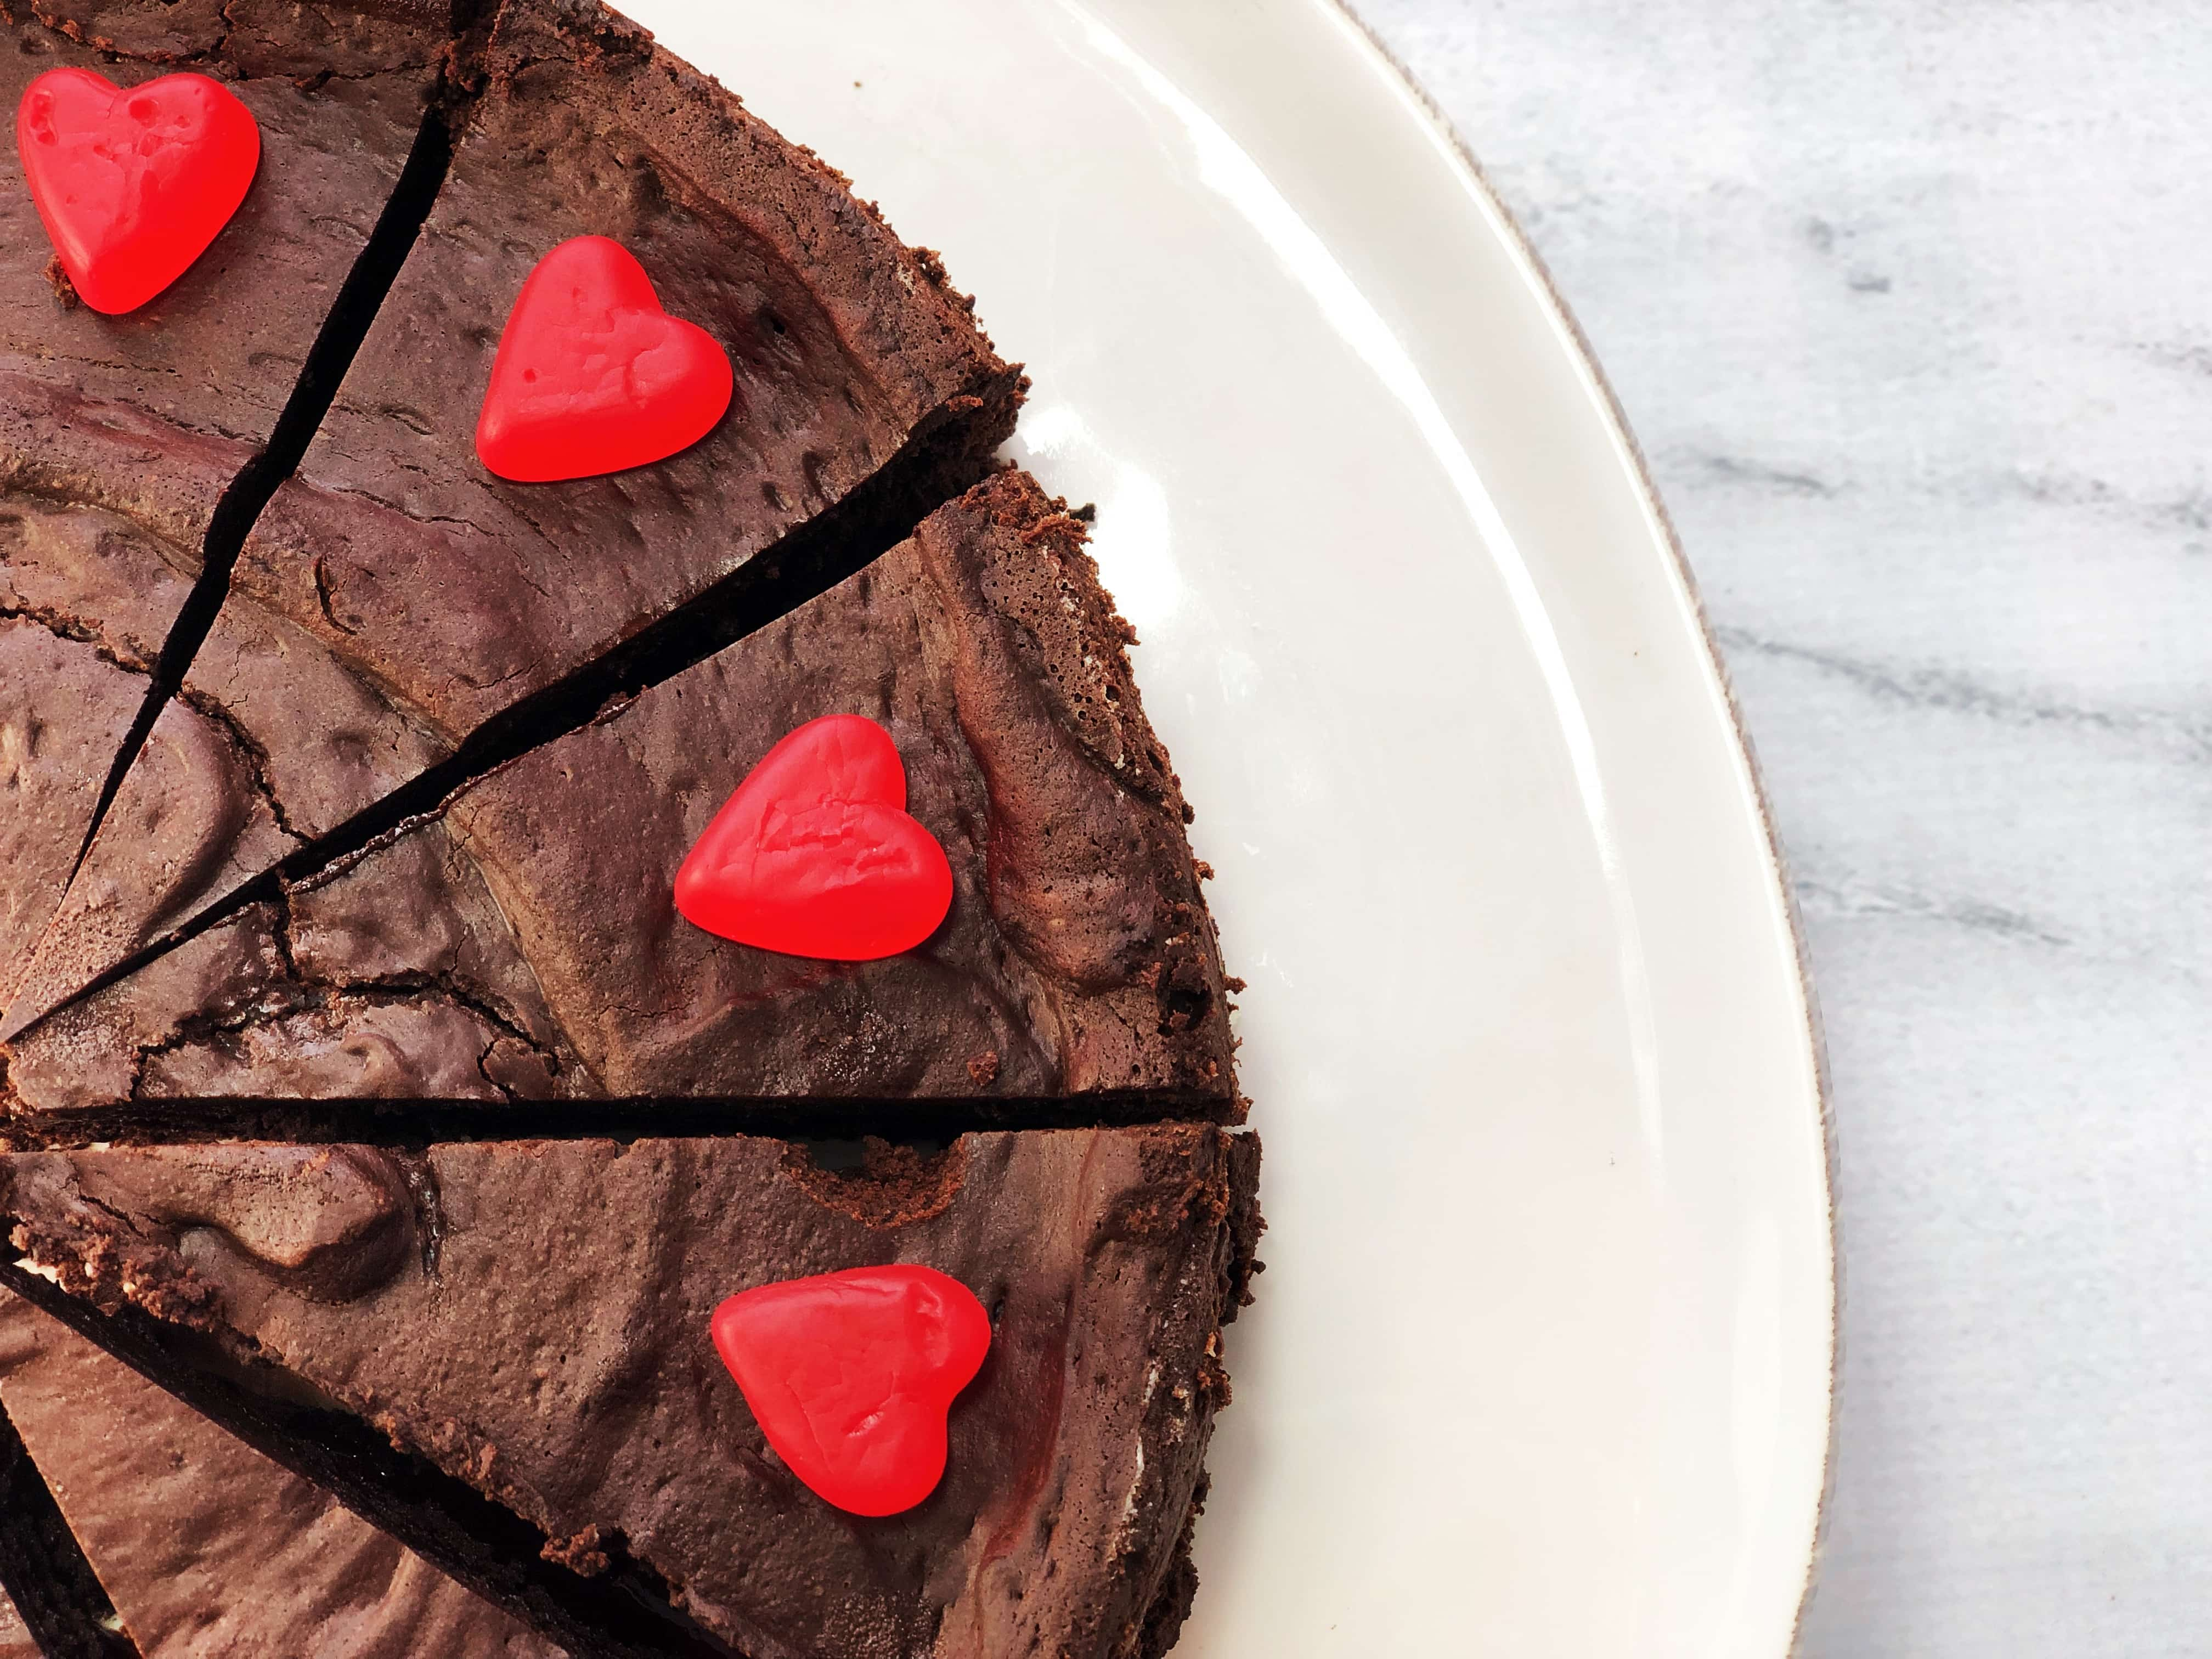 Rose Beranbaum Chocolate Oblivion Truffle Cake